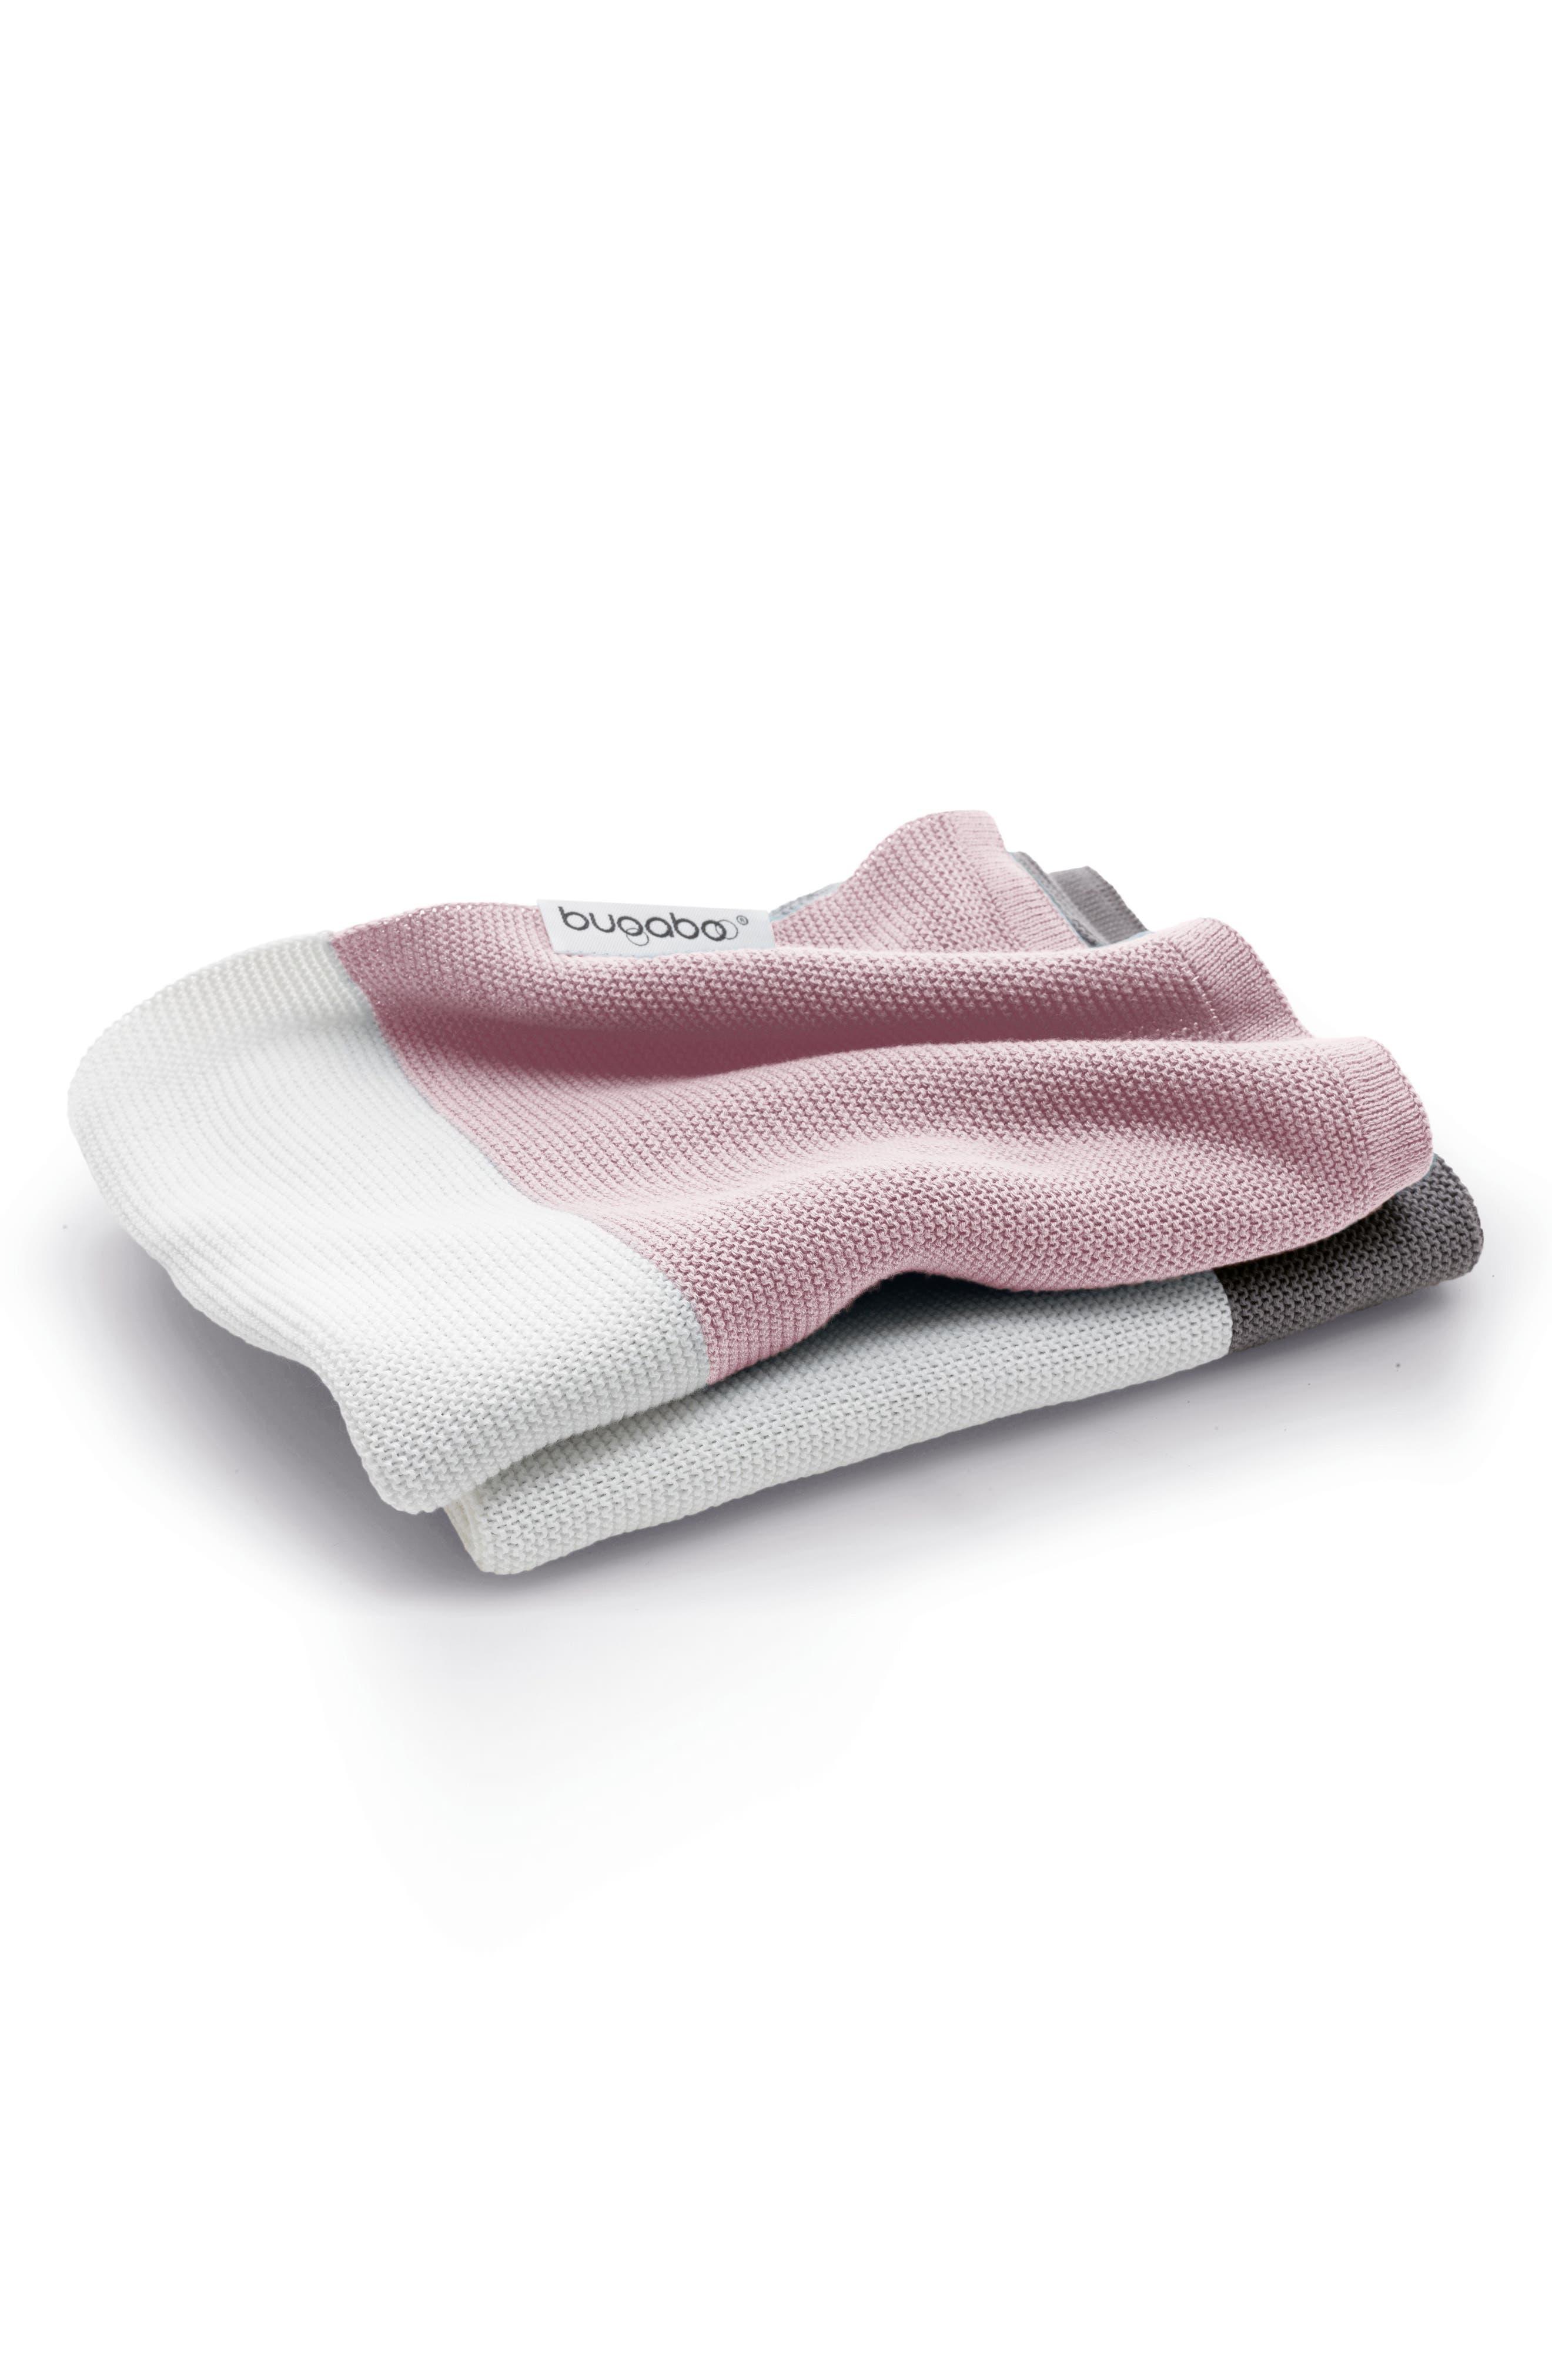 Light Cotton Blanket,                             Main thumbnail 1, color,                             SOFT PINK